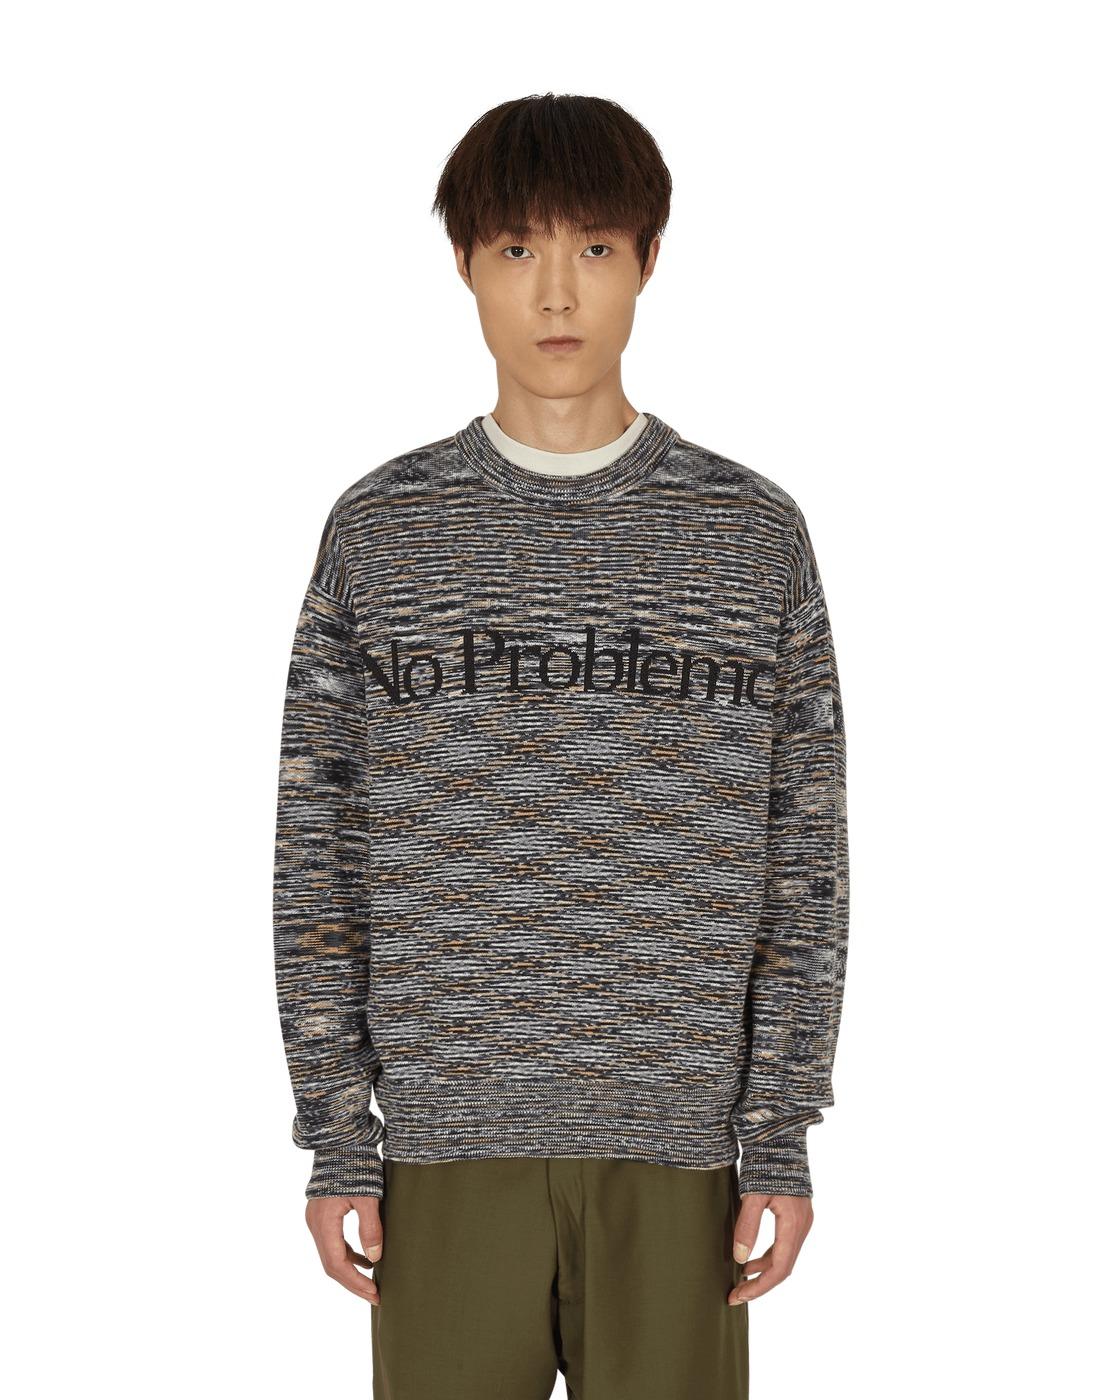 Photo: Aries Space Dye No Problemo Crewneck Sweater